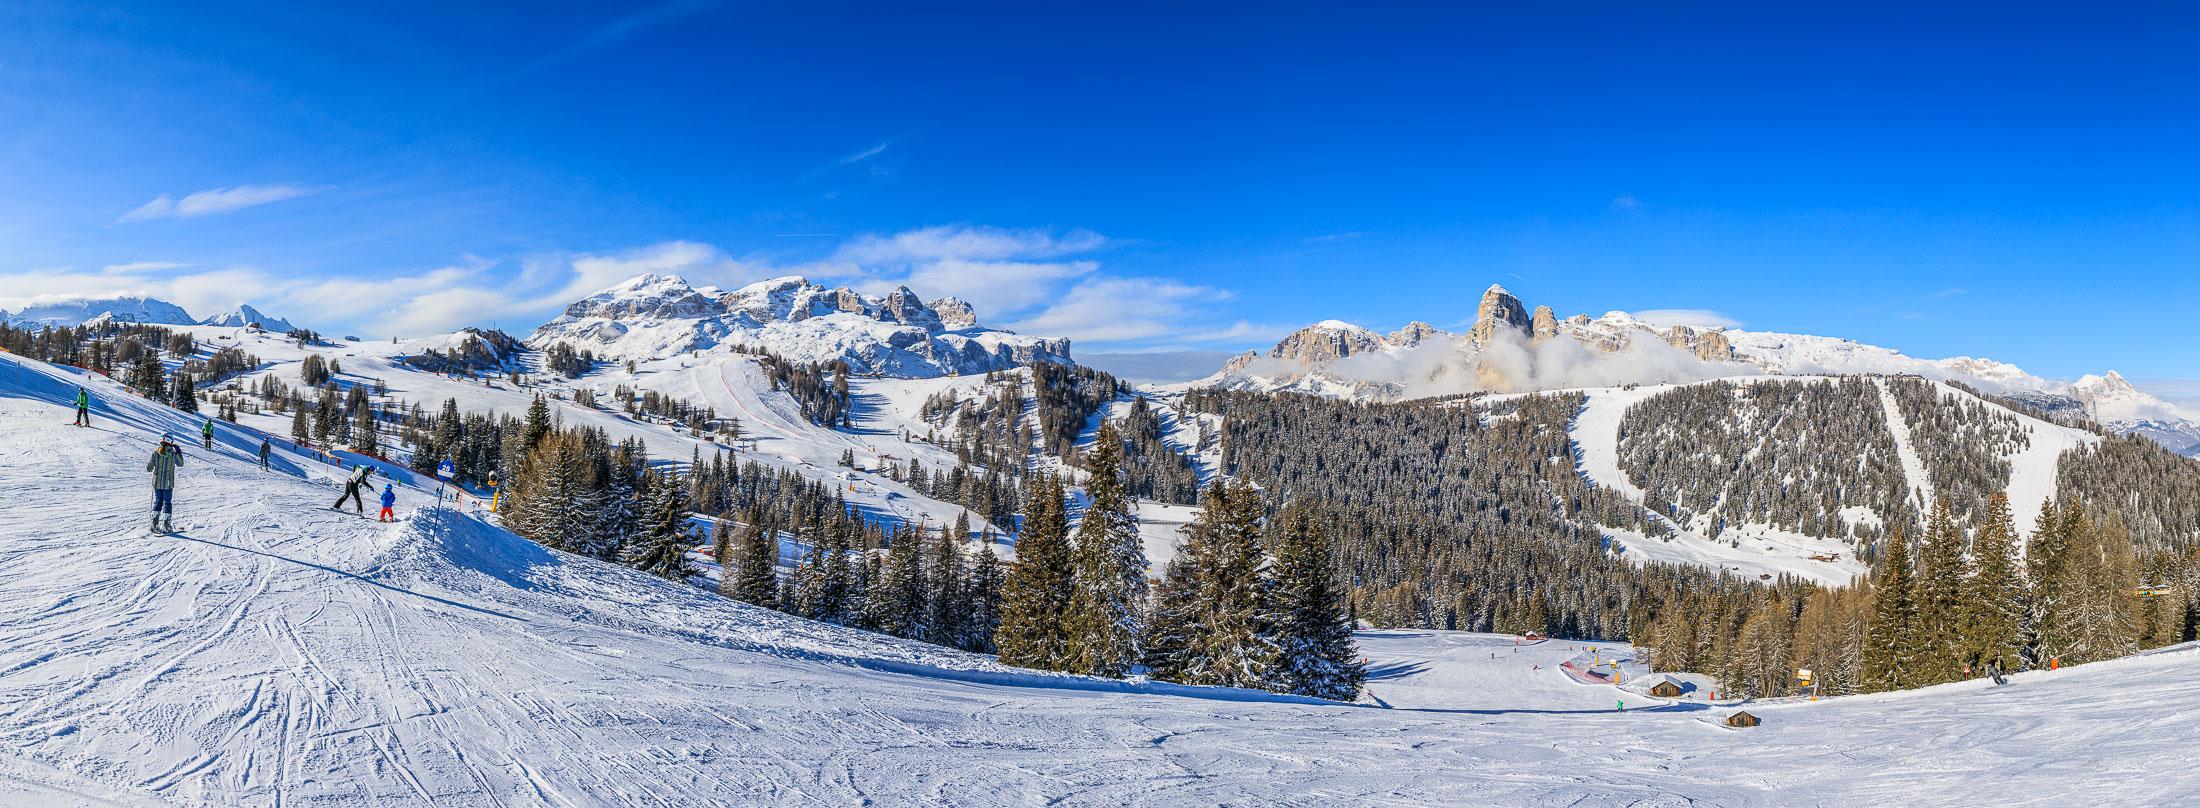 Dolomiti panorama - winter 2017 - Jus Medic